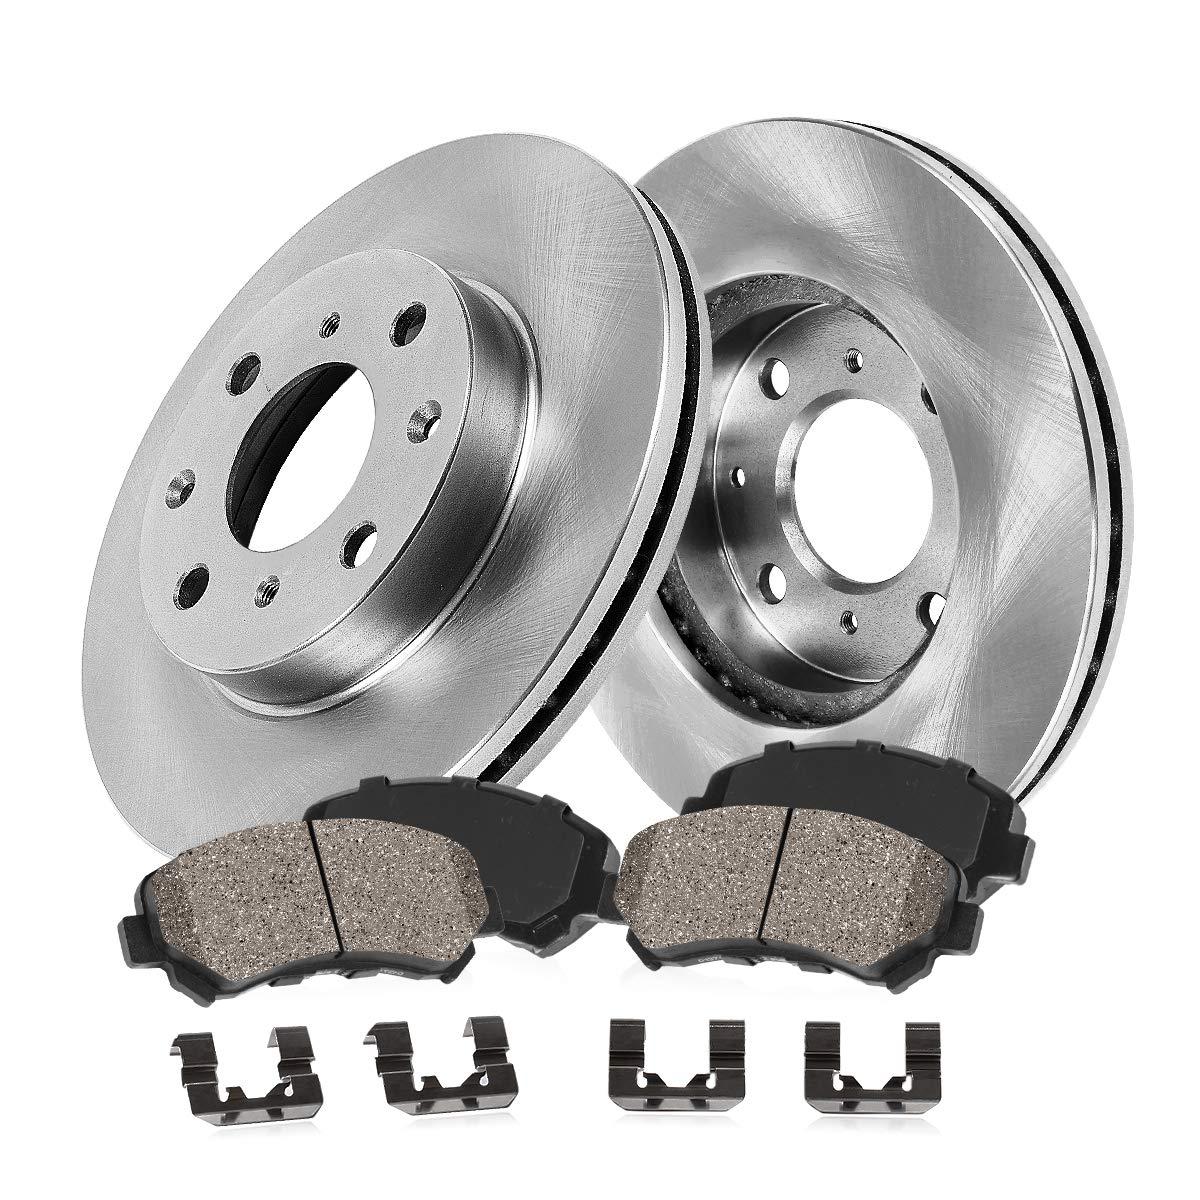 FRONT 255 mm Premium OE 4 Lug [2] Brake Disc Rotors + [4] Ceramic Brake Pads + Clips Callahan Brake Parts